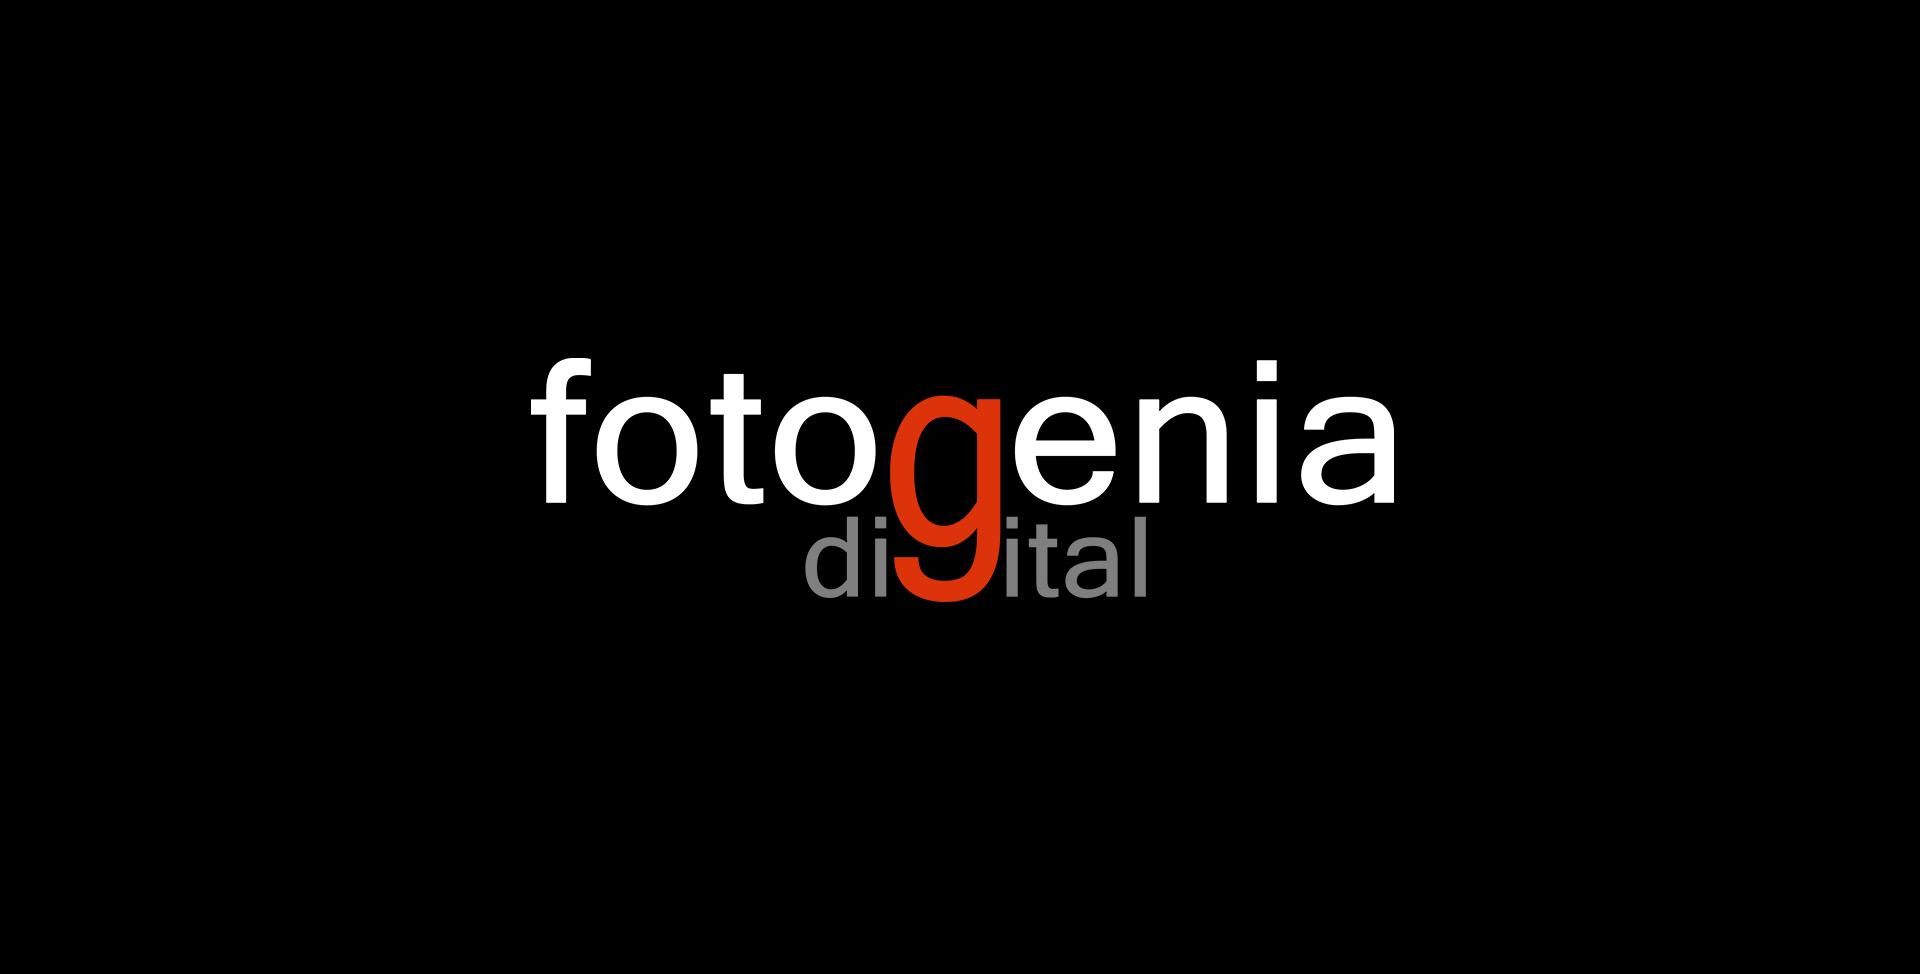 FOTOGENIA DIGITAL